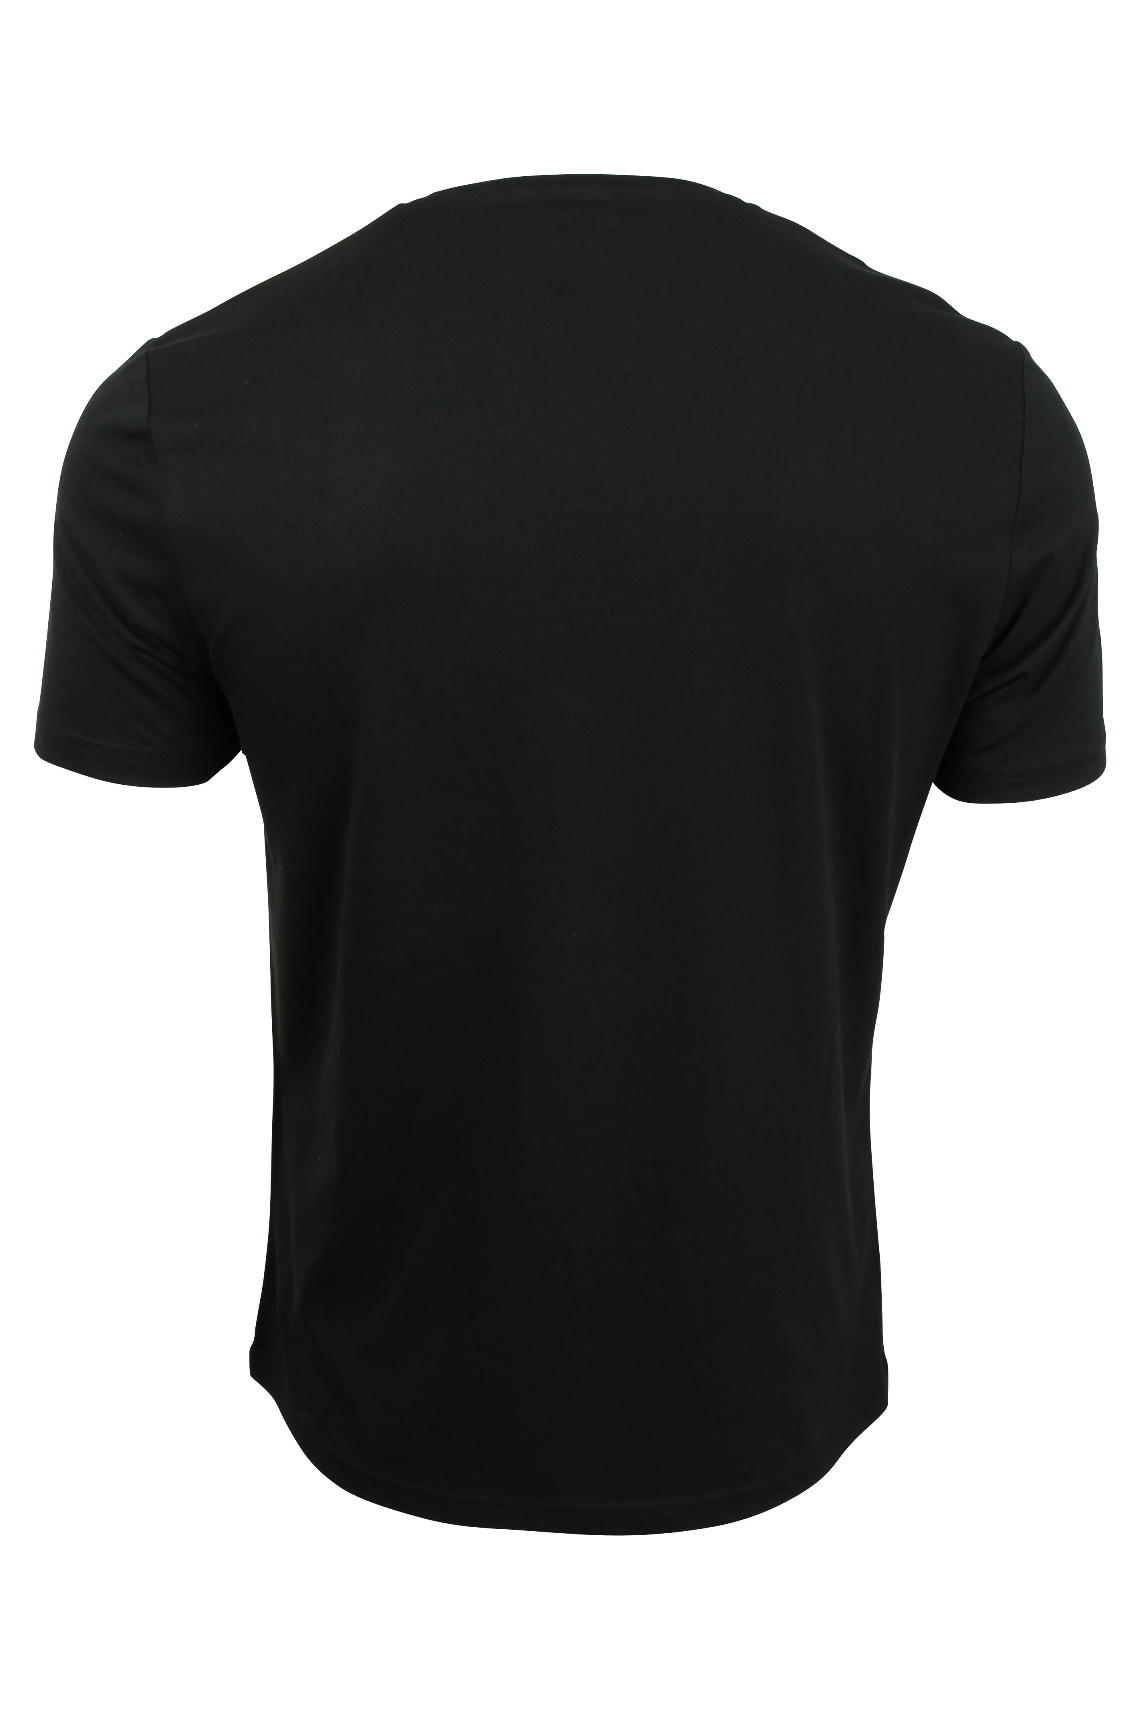 Mens-Classic-Spade-Pocket-T-Shirt-by-Ben-Sherman thumbnail 5